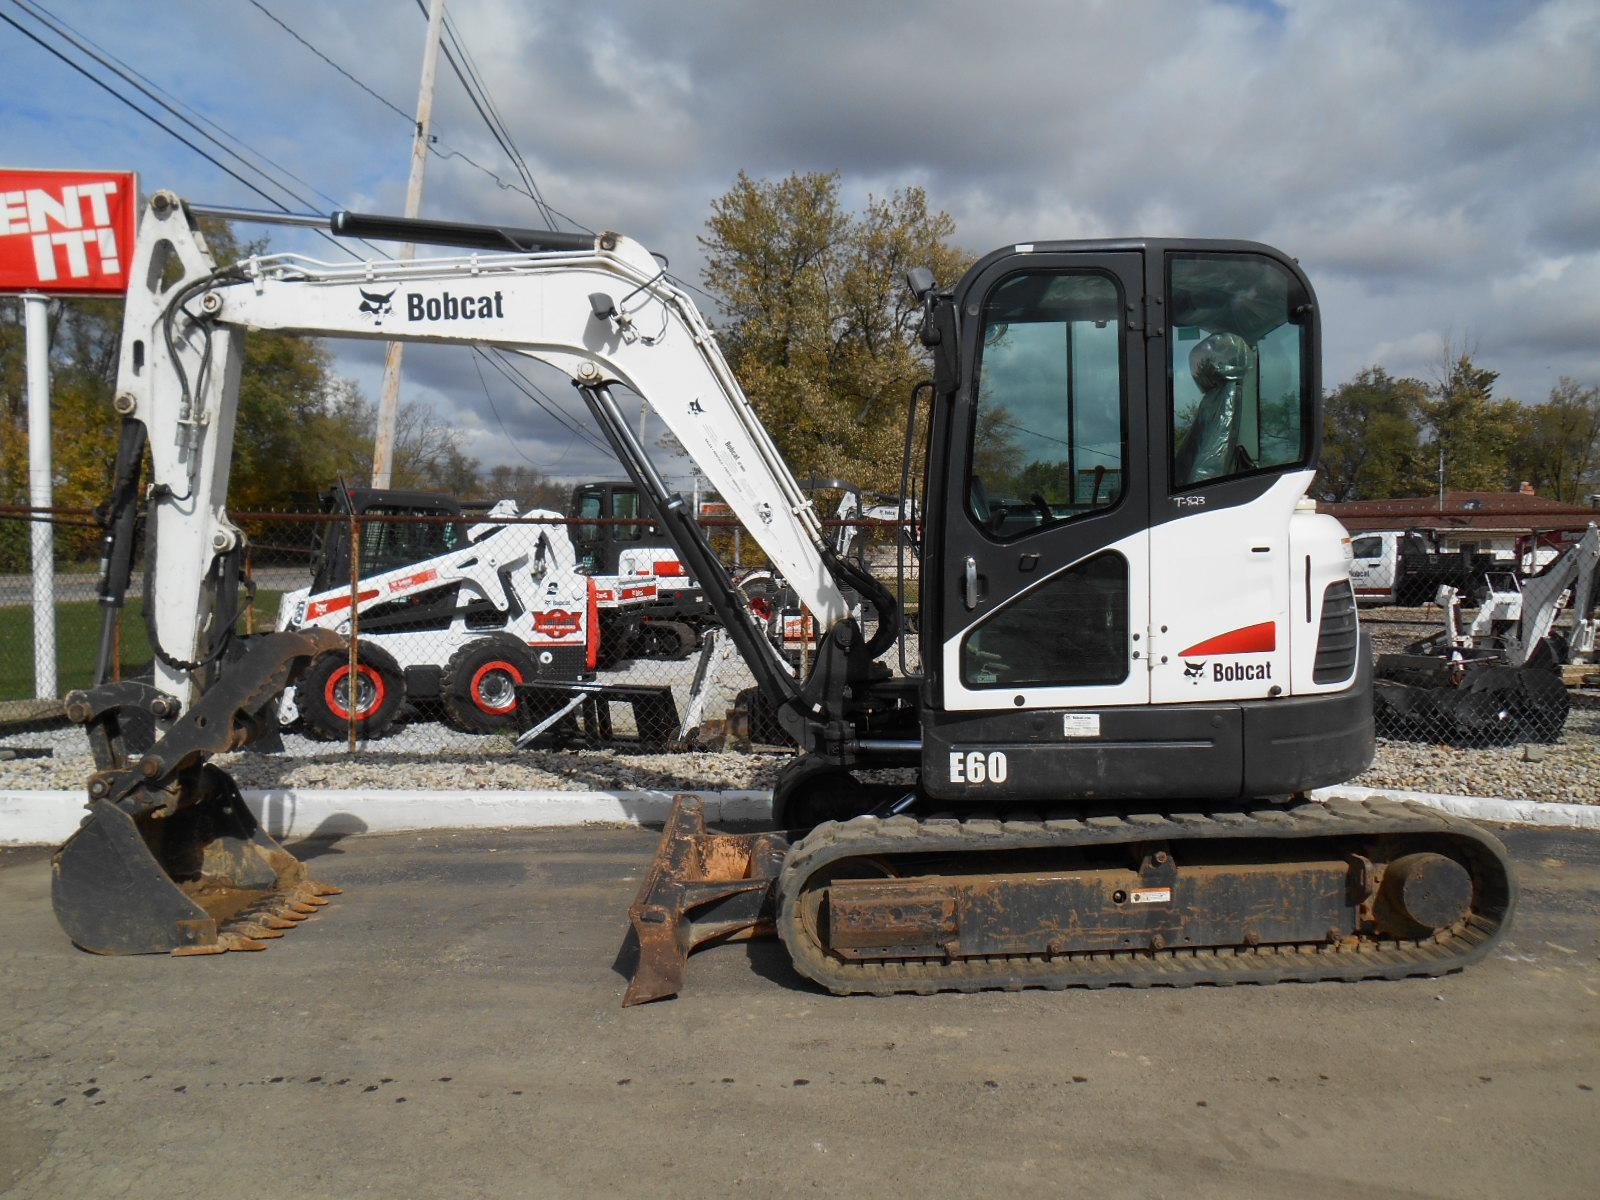 bobcat e60 compact excavator service manual download bobcat excavator e60 wiring diagram [ 1600 x 1200 Pixel ]